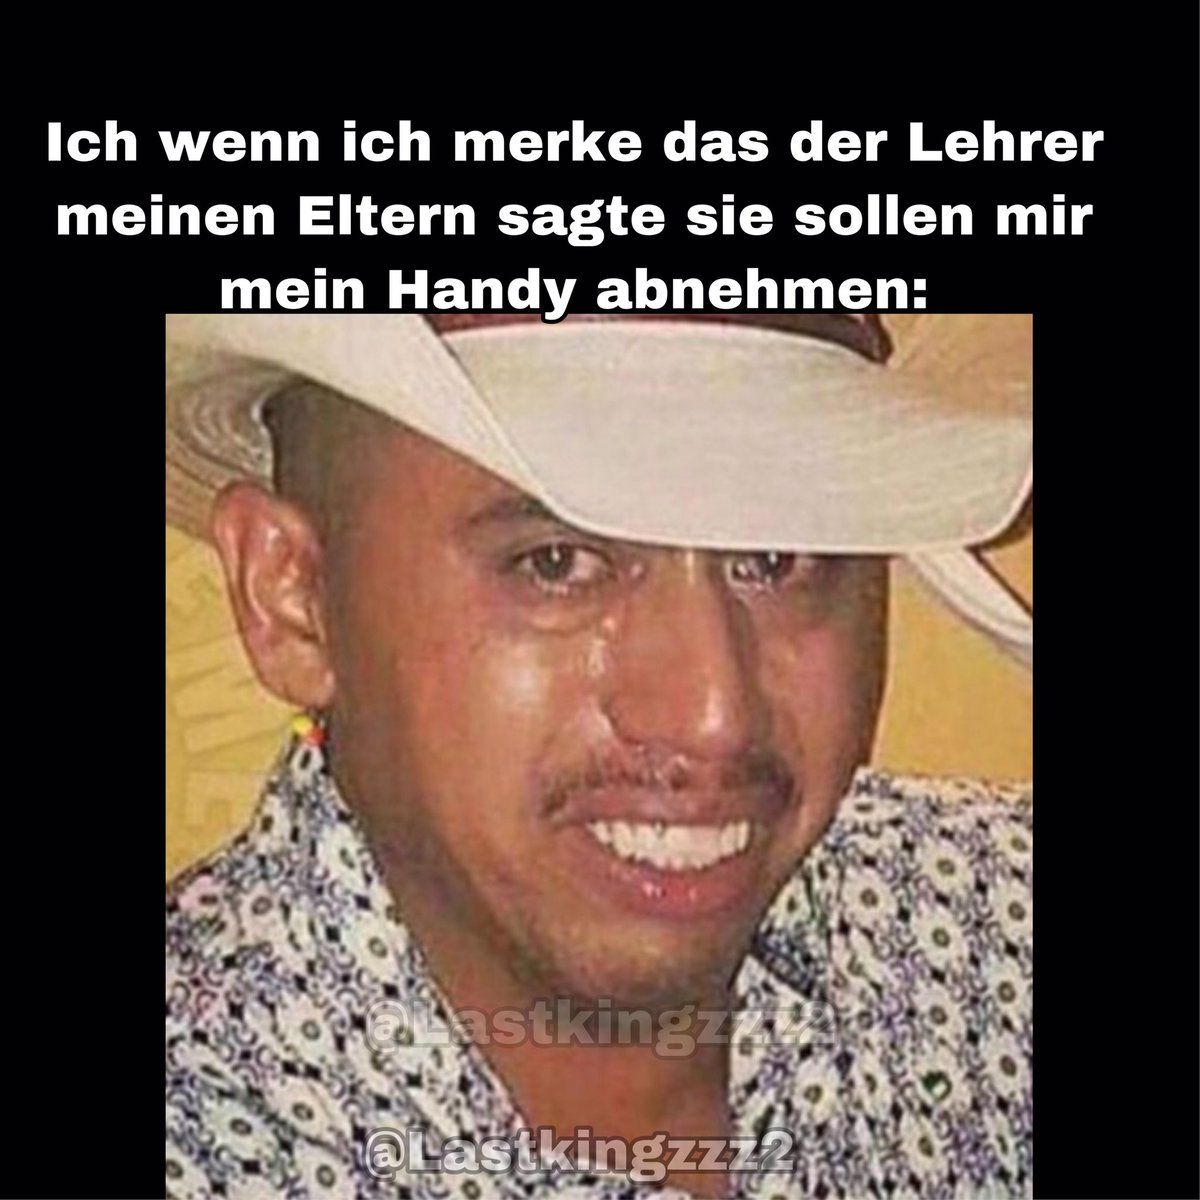 #memes #meme #memesdaily #GermanMeme pic.twitter.com/p4Clx3N6SZ